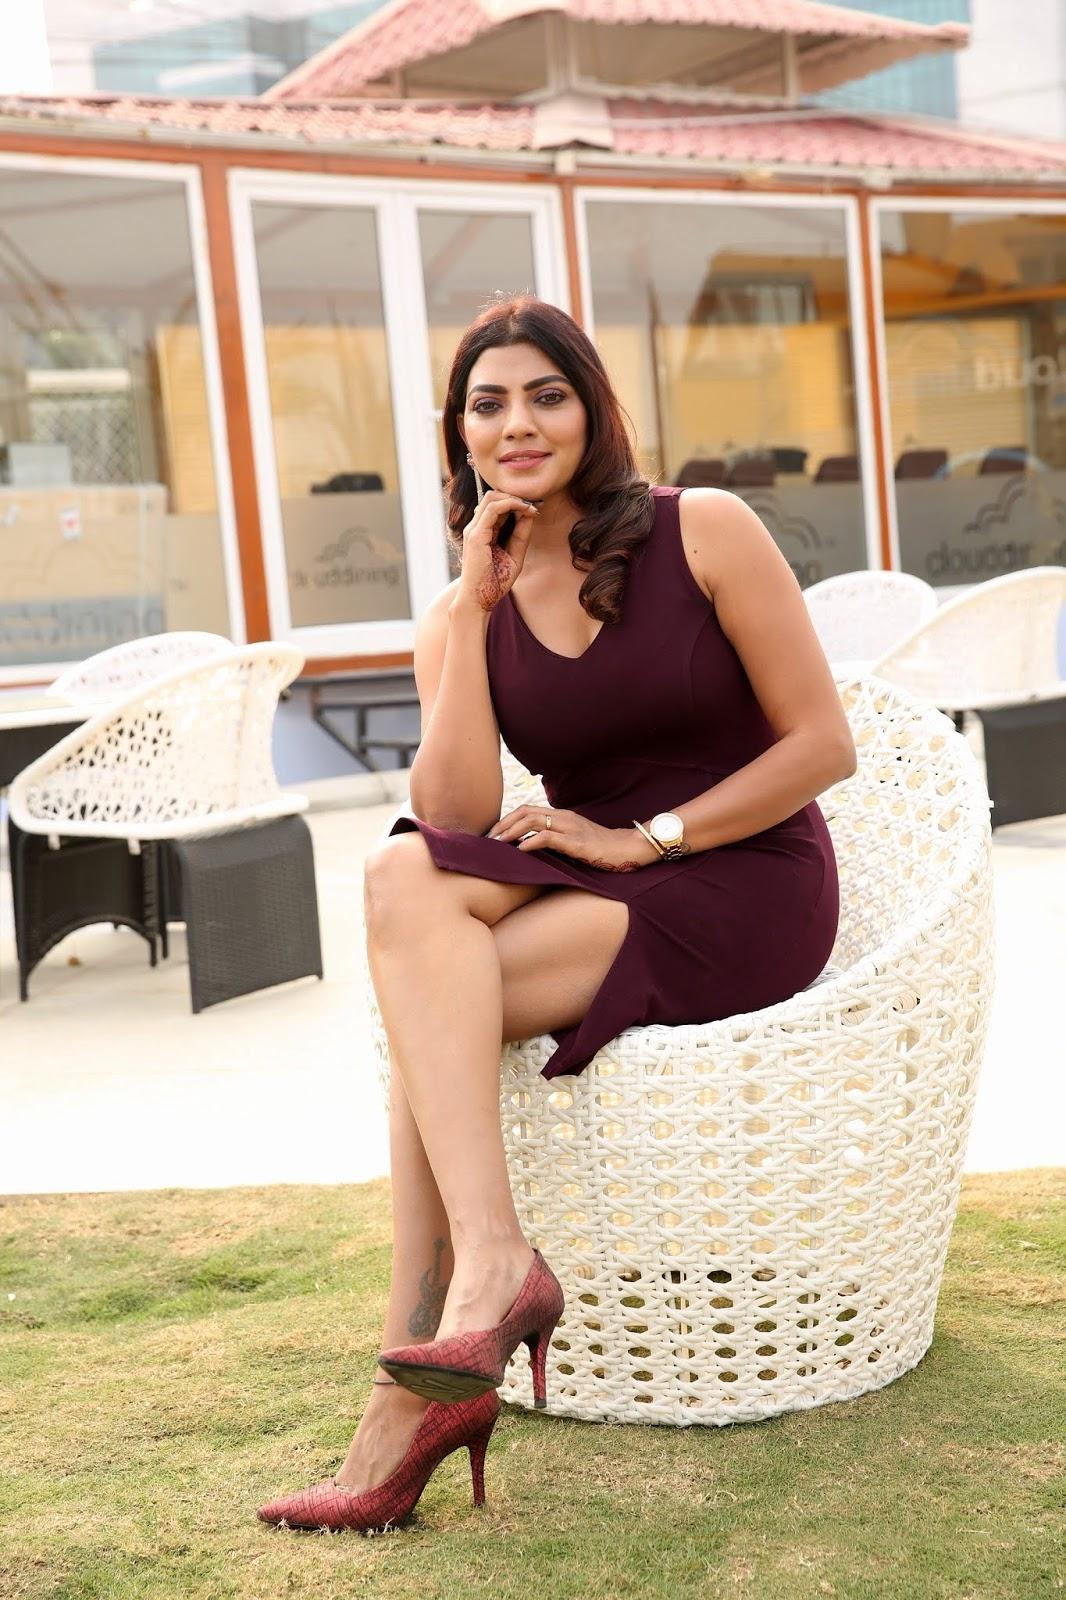 Lahari's Big Bum and Hot Legs In Tight Mini Dress